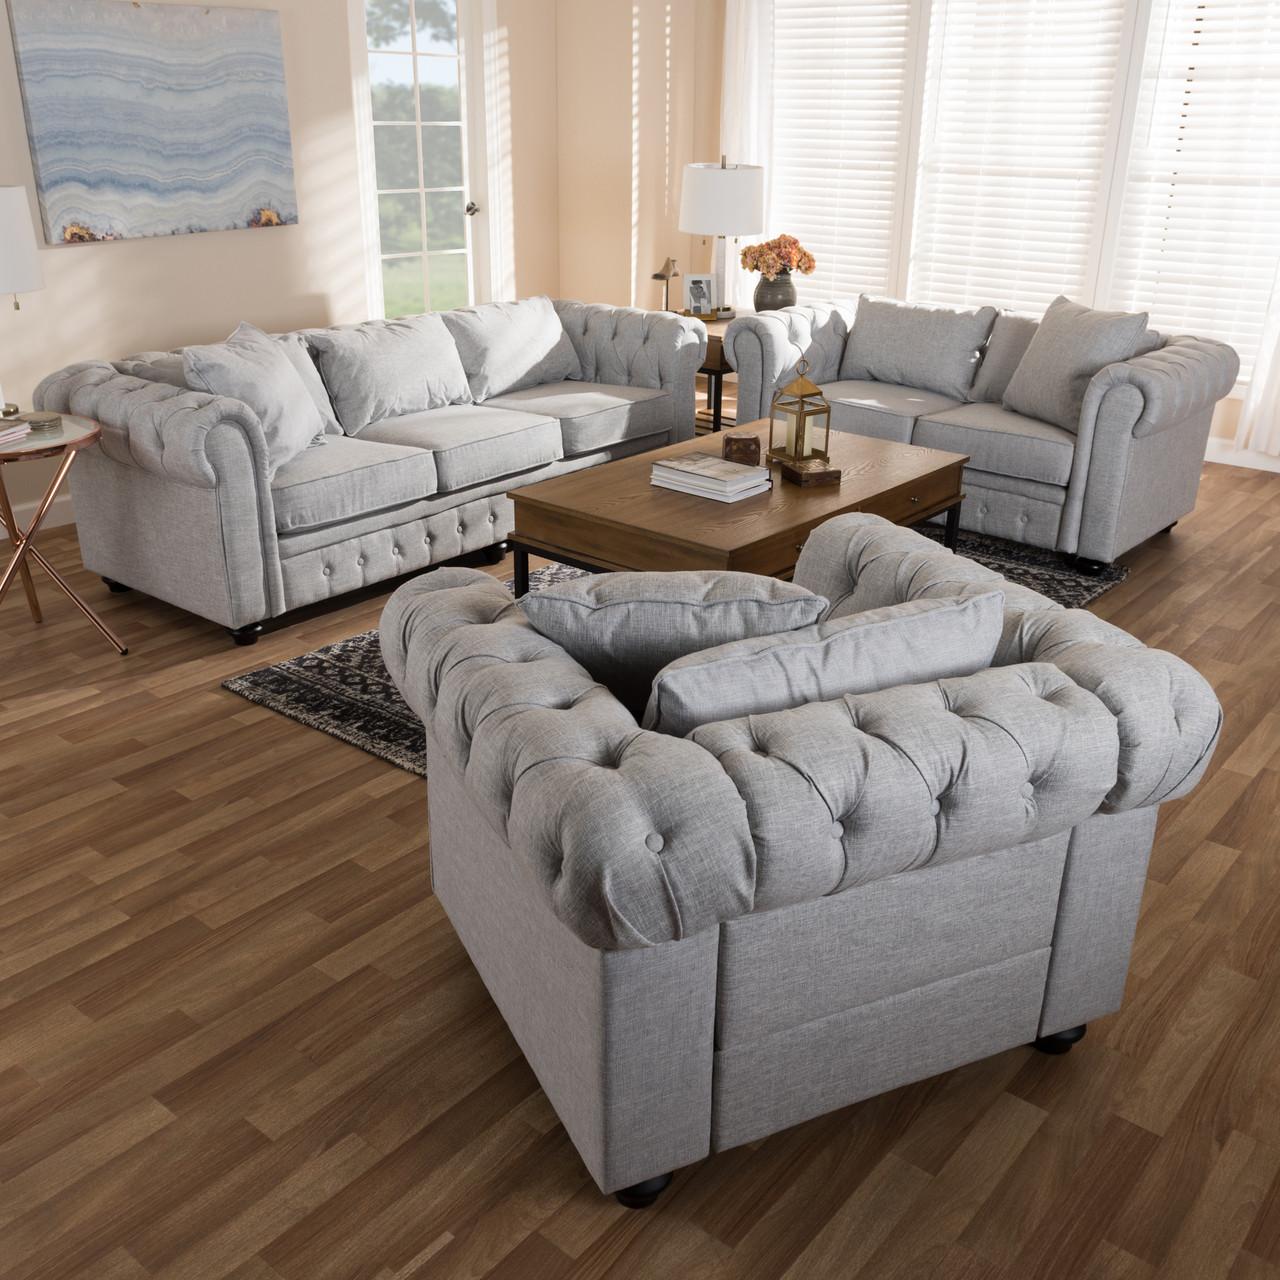 Baxton studio alaise modern classic grey linen tufted scroll arm chesterfield 3 piece living room set dealbeds com